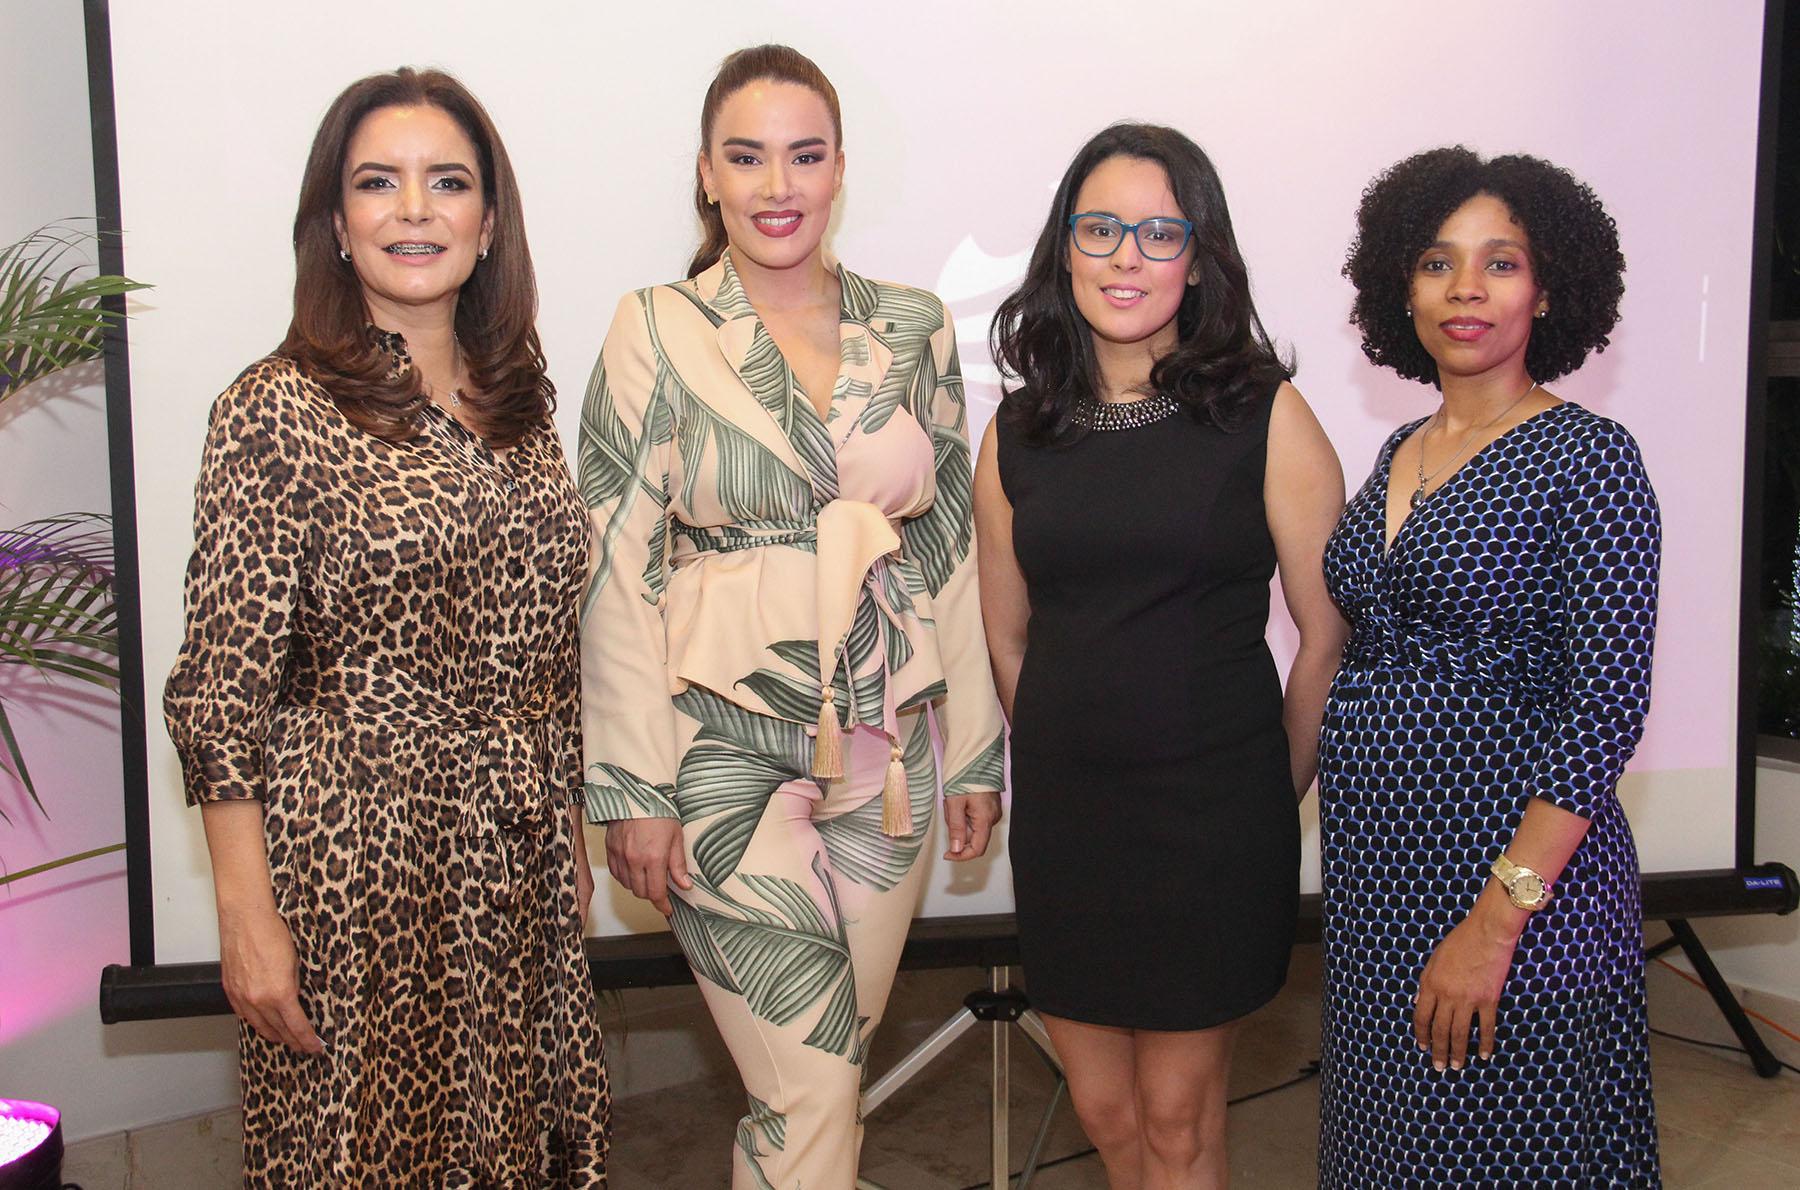 Principal Ada Fernandez, Isaura Taveras, Ana Teresa Martínez y Celeste Olavarria